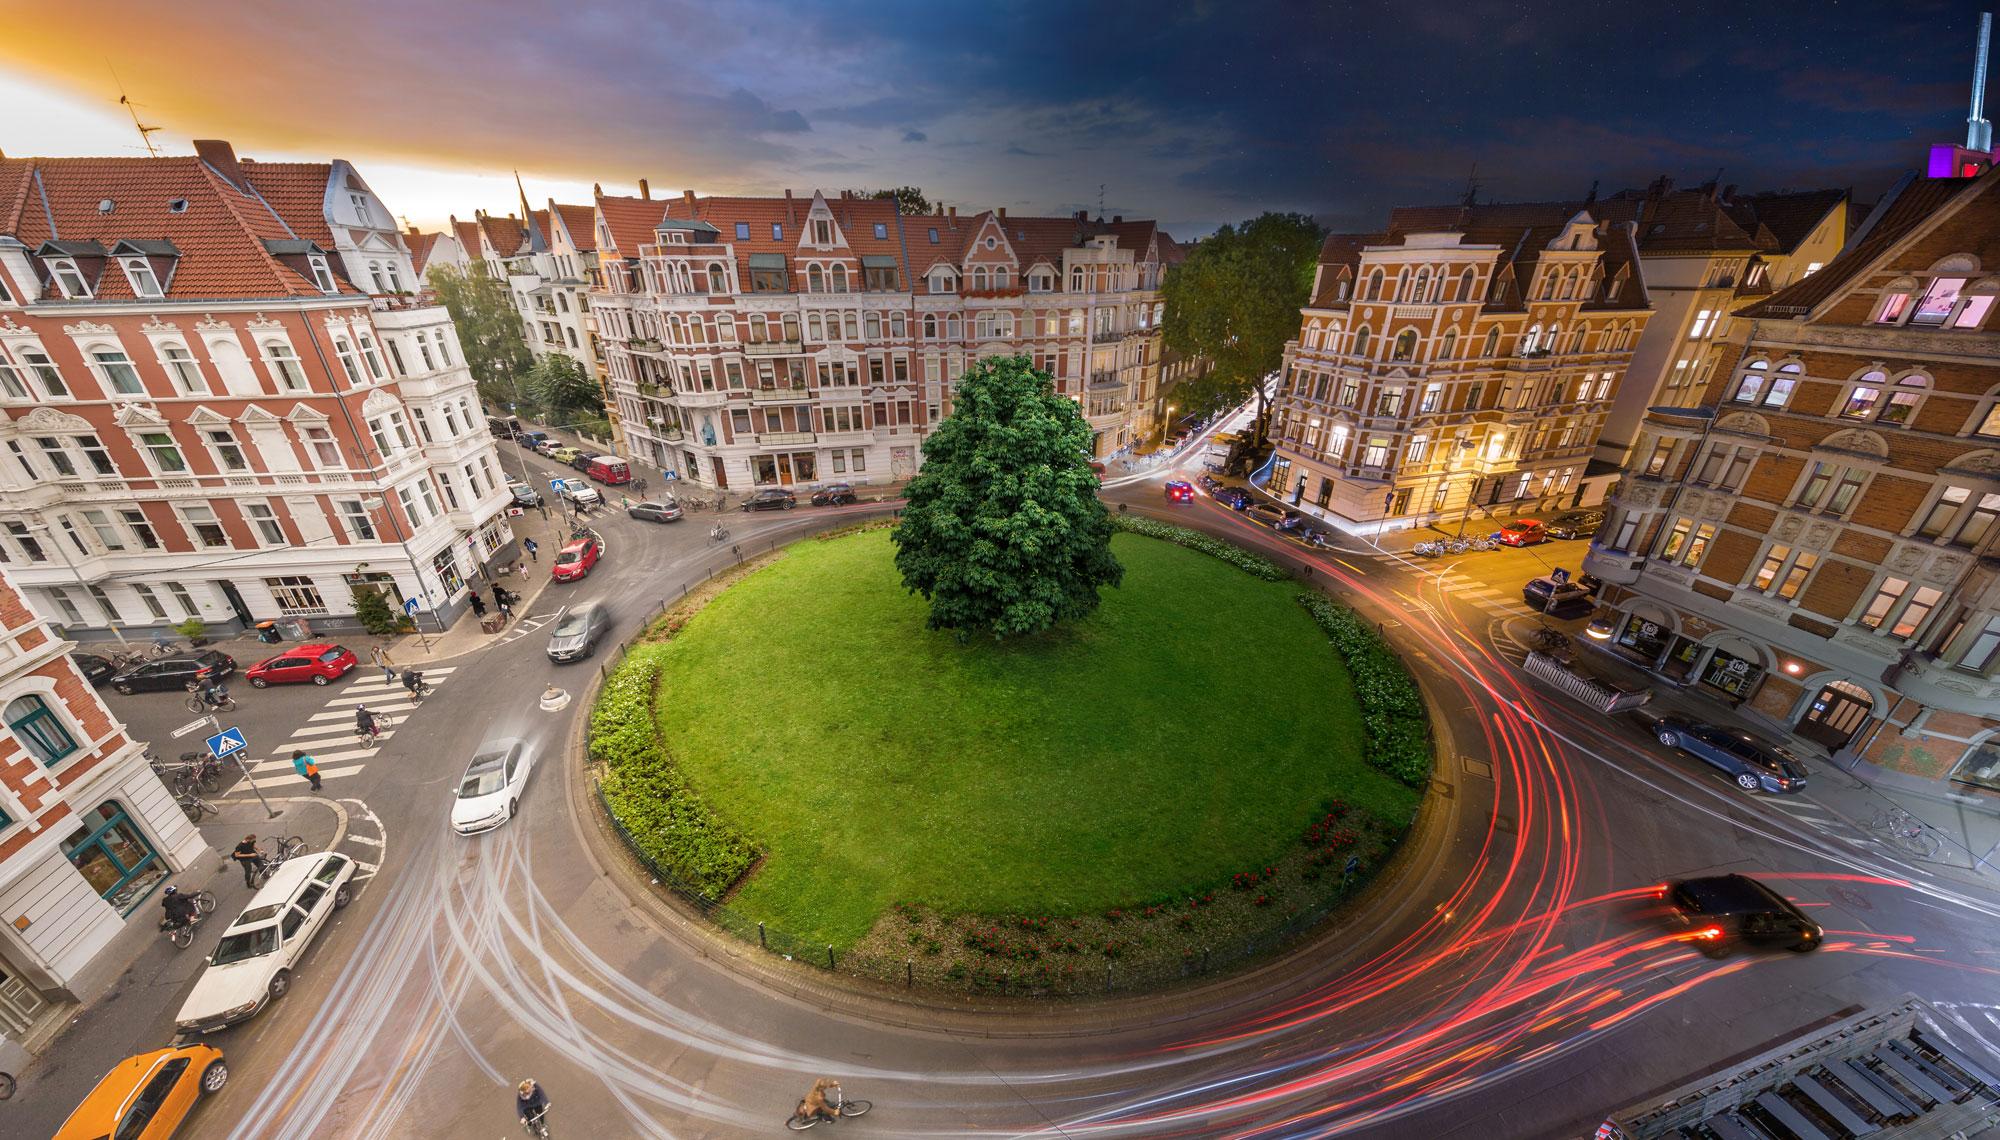 Lichtenbergplatz Linden Hannover Timelapse Hannover Timelapse